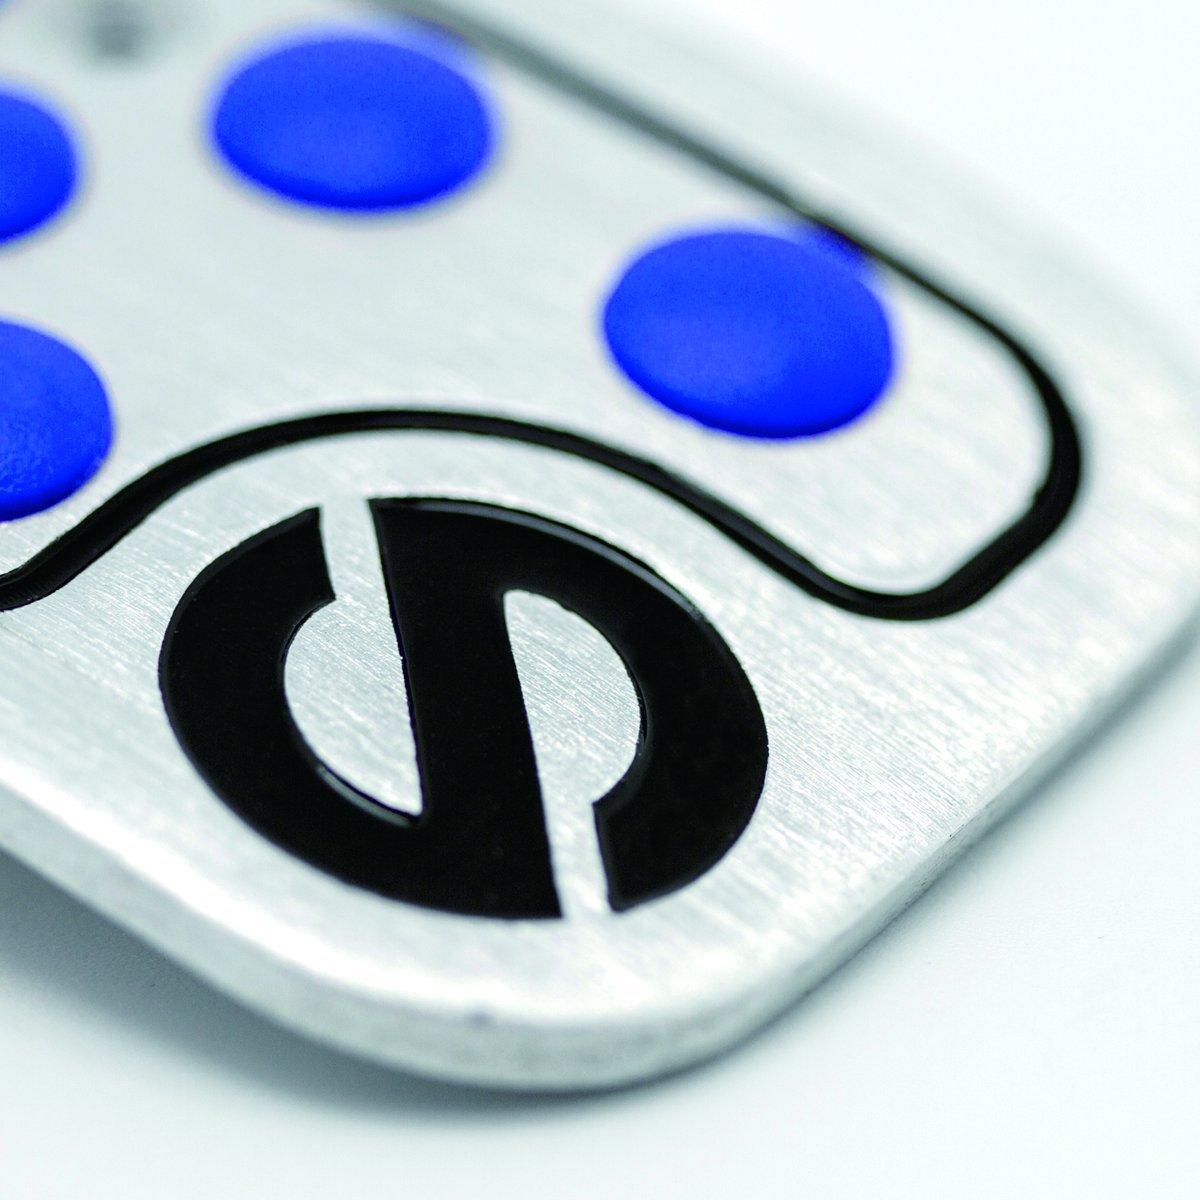 Racing pedal set blue rubber